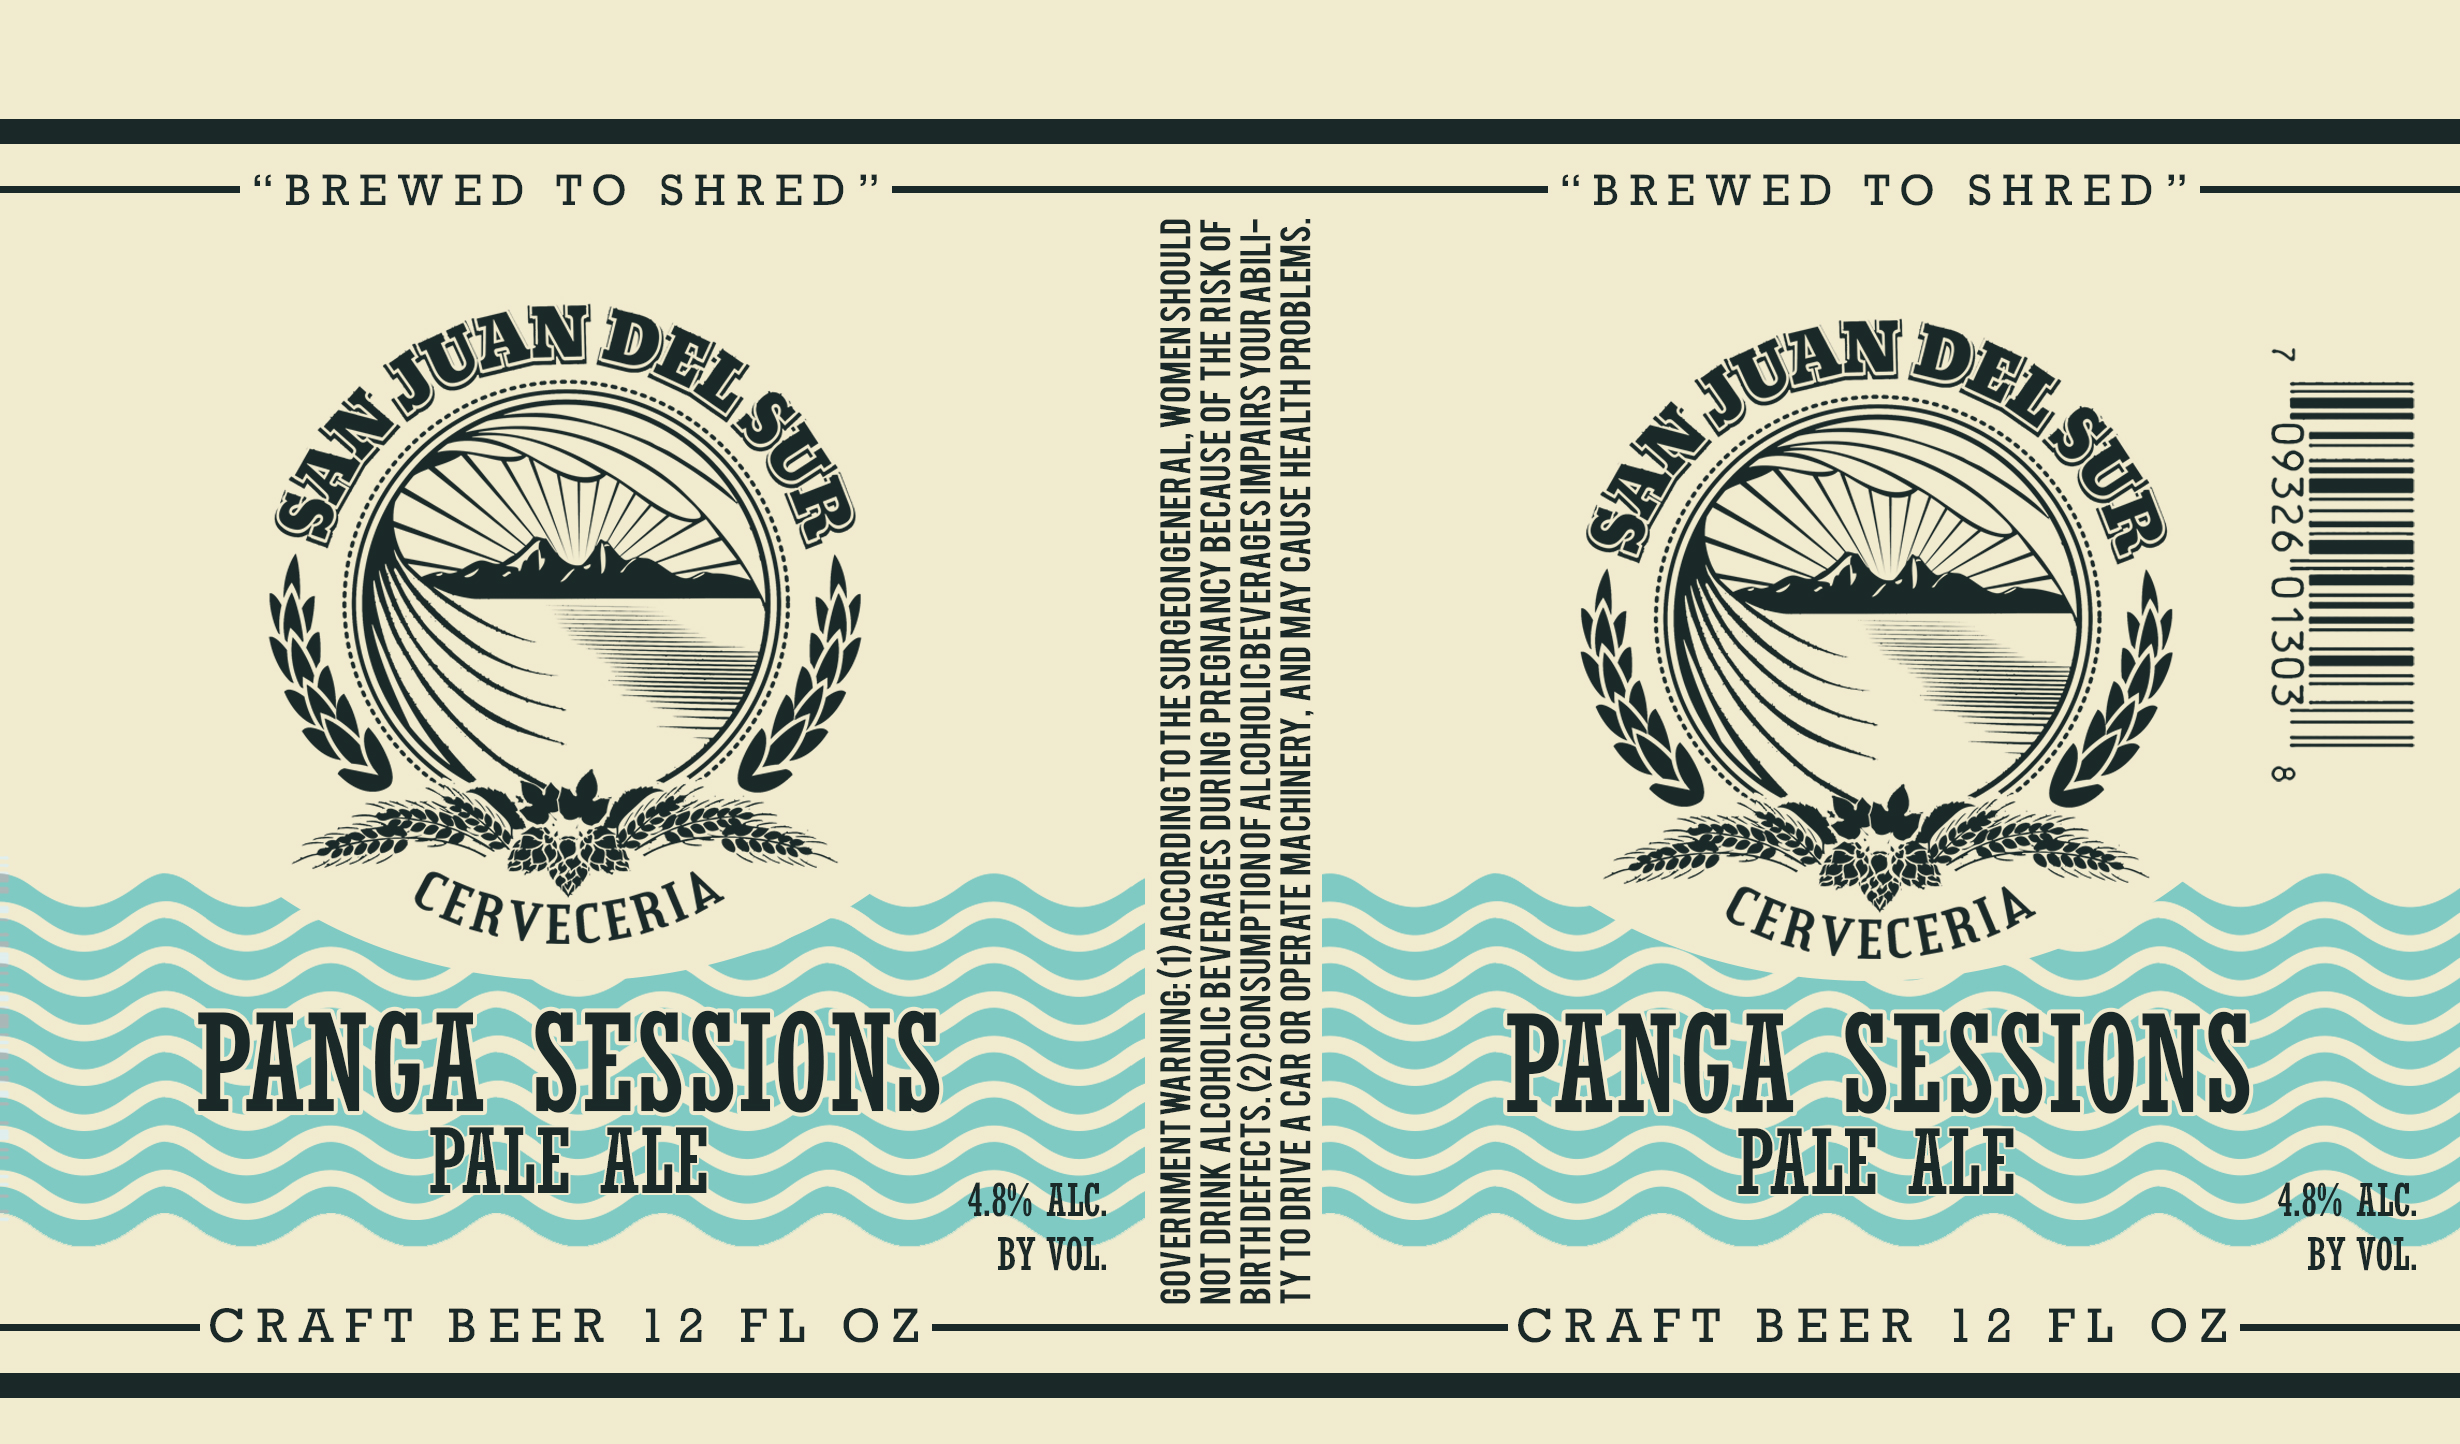 Panga-Sessions-02.jpg